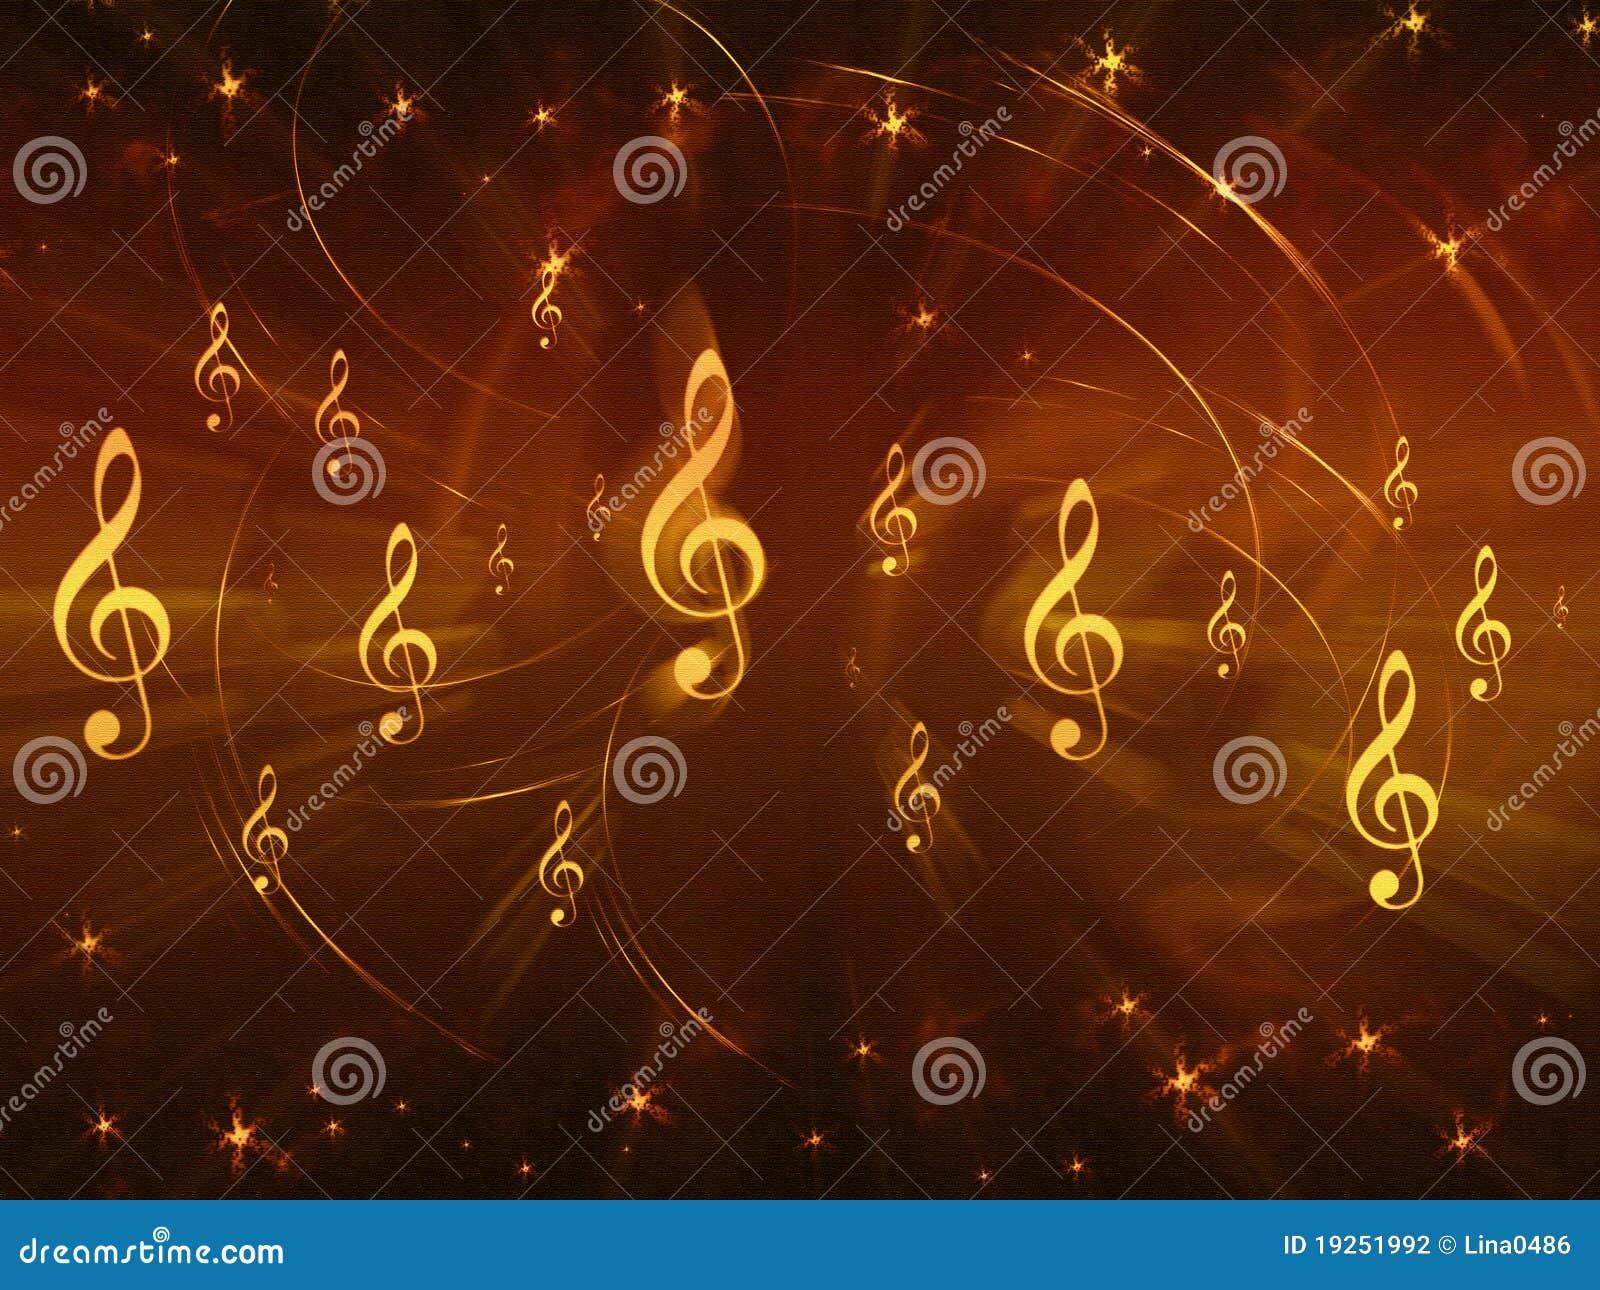 background of musical symbols stock photography image